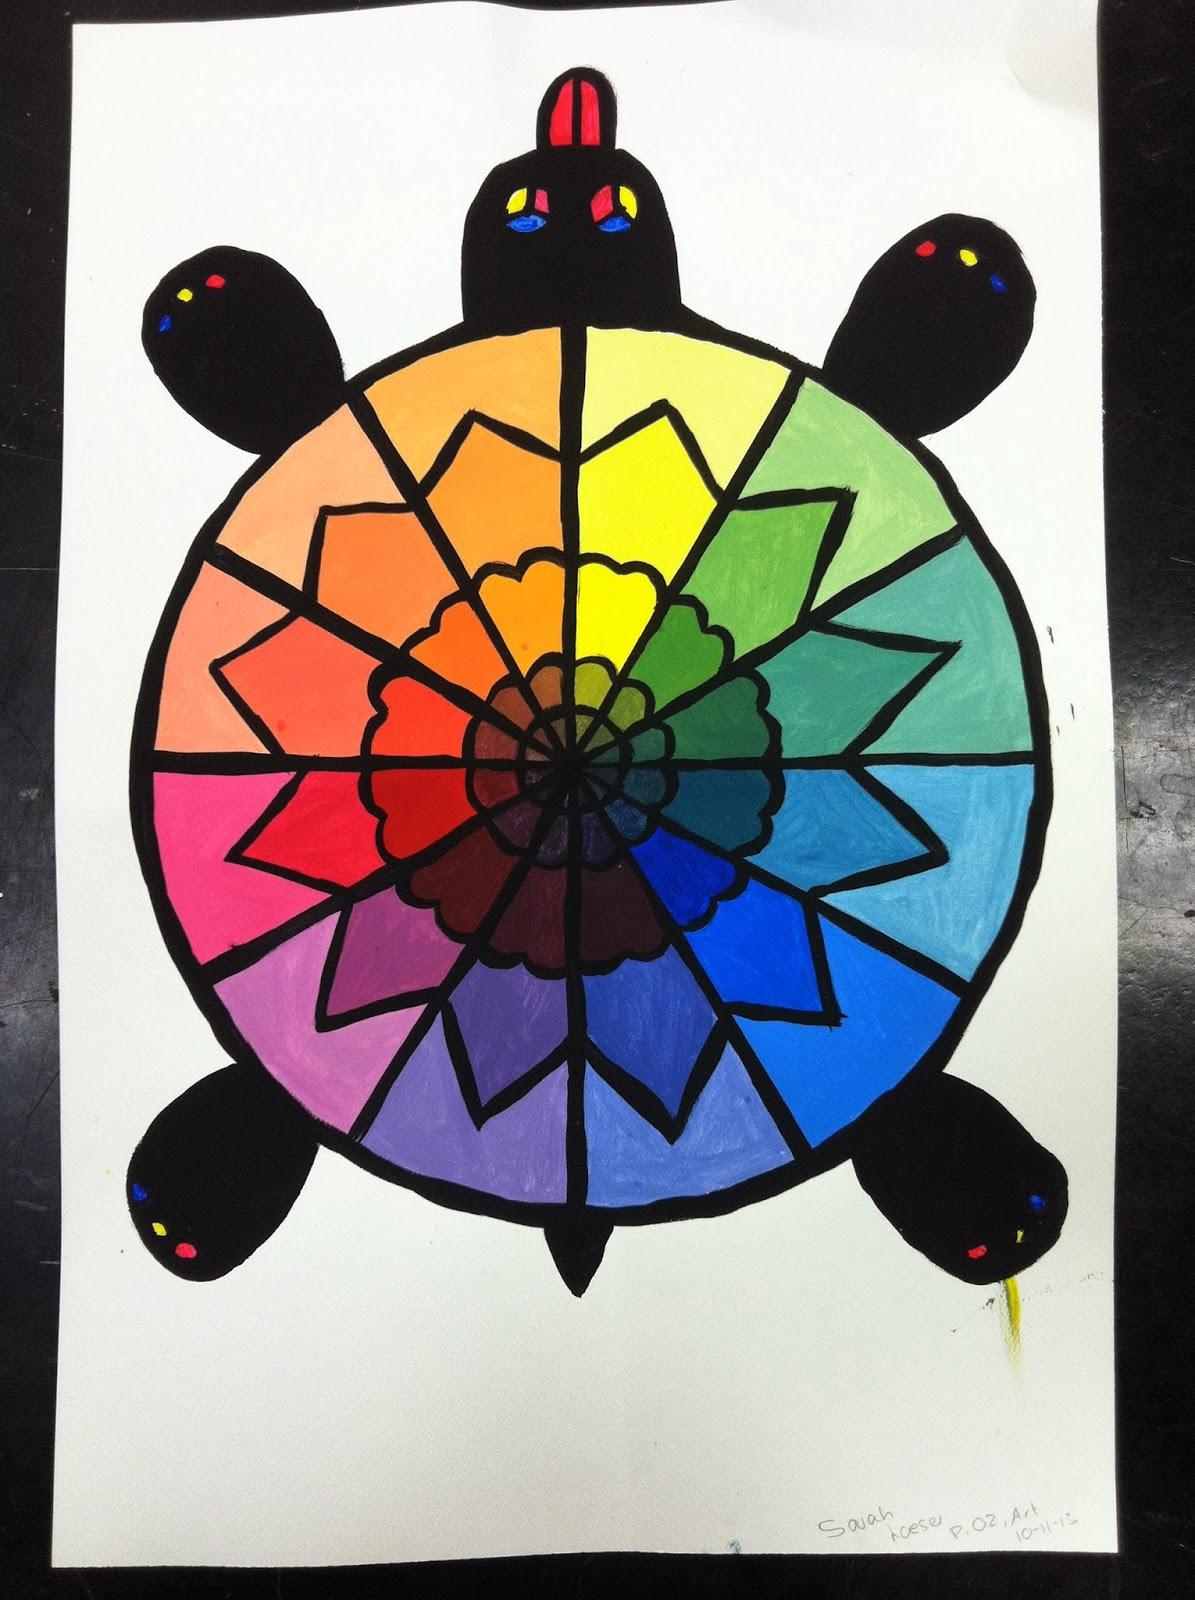 adventures of creativity student work creative color wheels. Black Bedroom Furniture Sets. Home Design Ideas